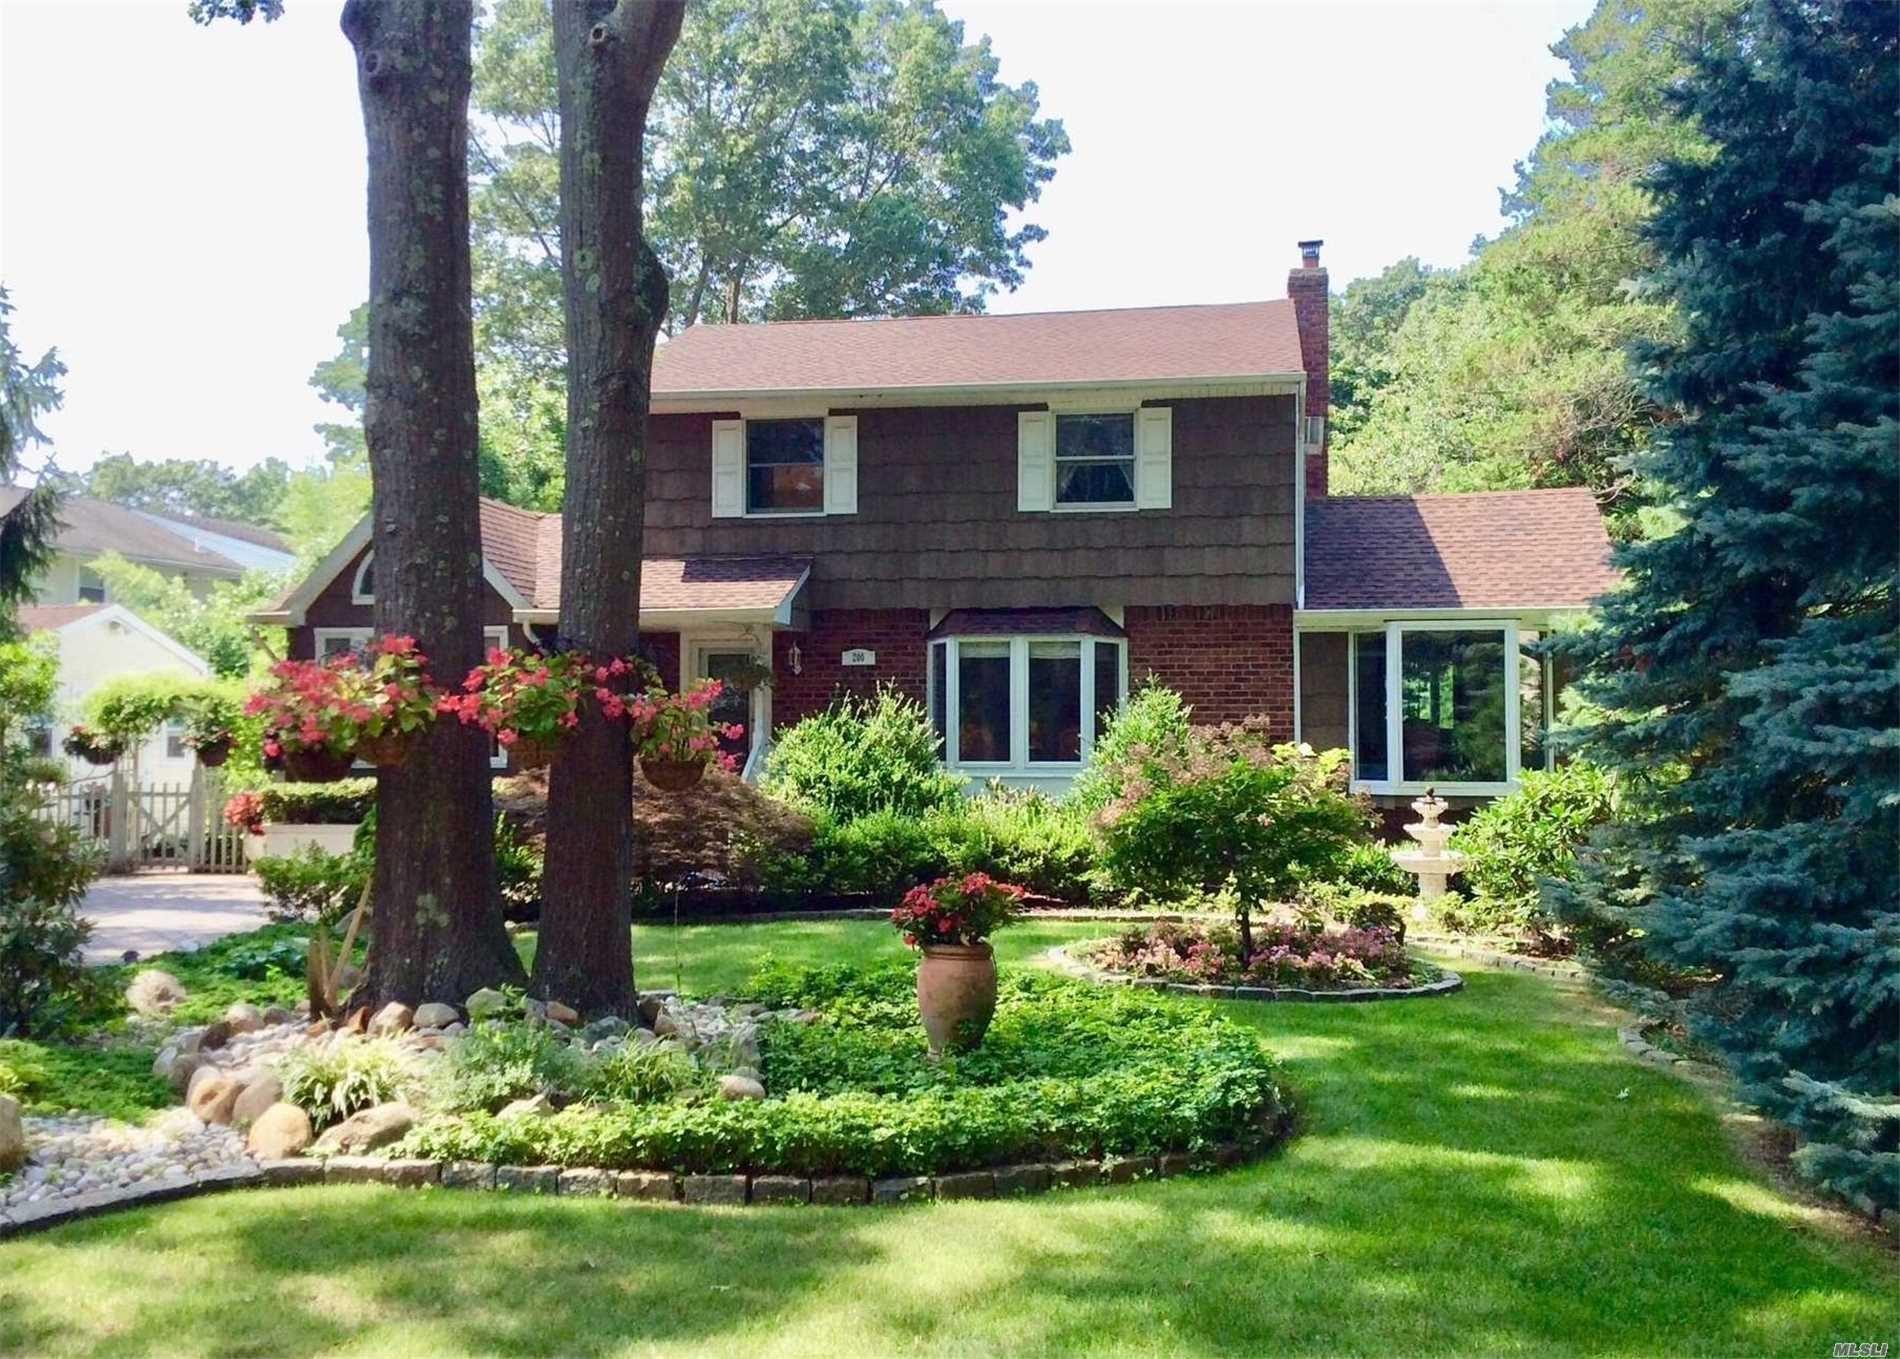 200 Country Village Lane, East Islip, NY 11730 - MLS#: 3207223